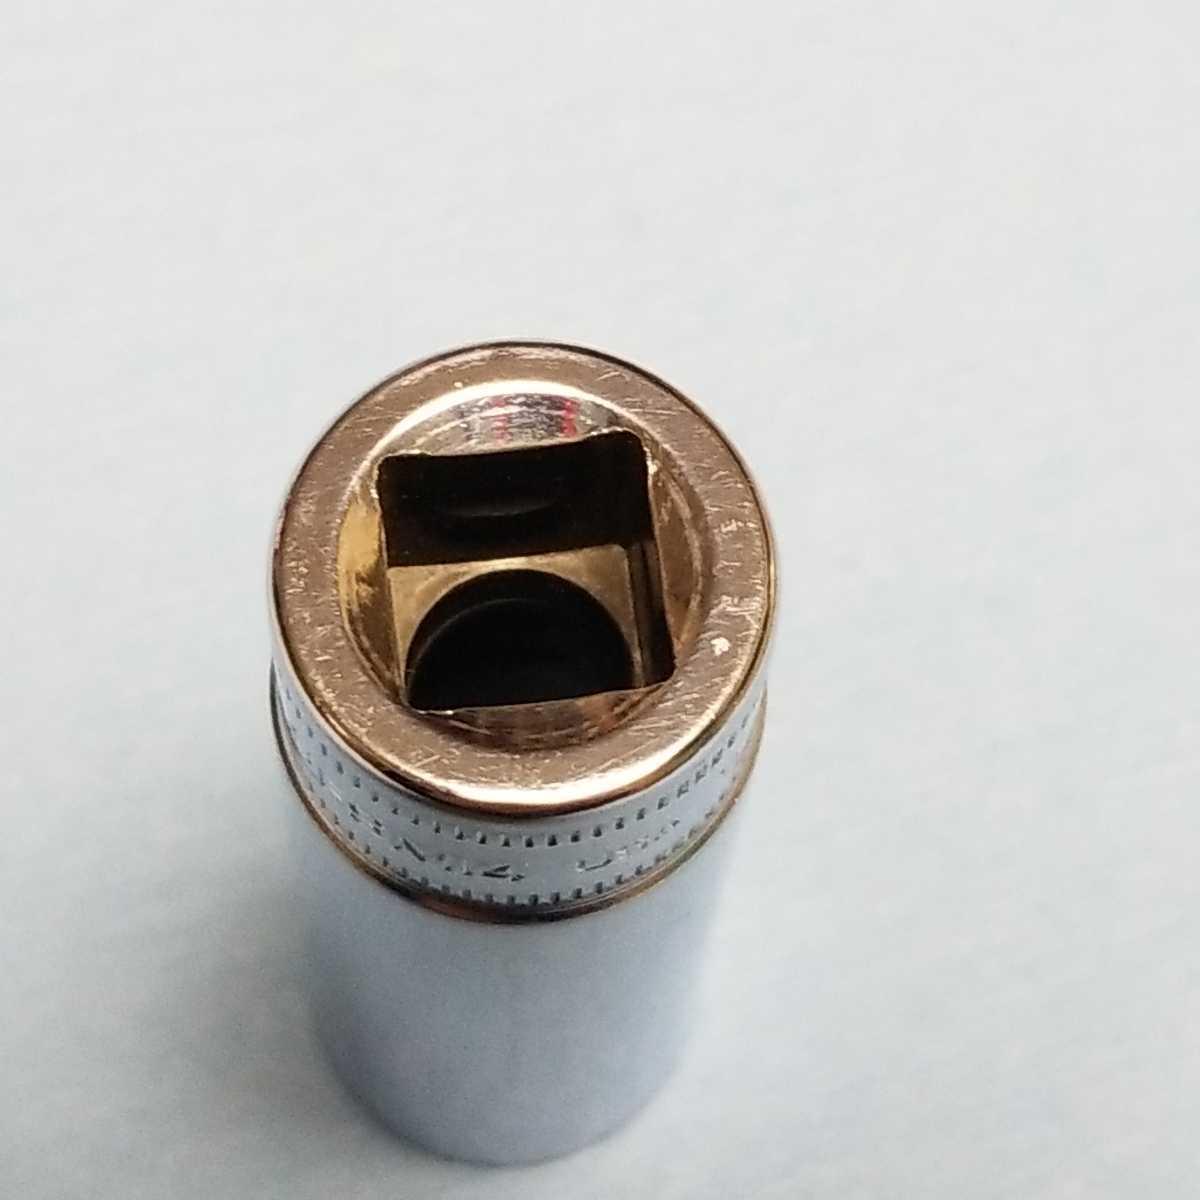 14mm 3/8 ディープ スナップオン SFSM14 (6角) 中古品 美品 保管品 SNAPON SNAP-ON ディープソケット ソケット 送料無料 Snap-on _画像7